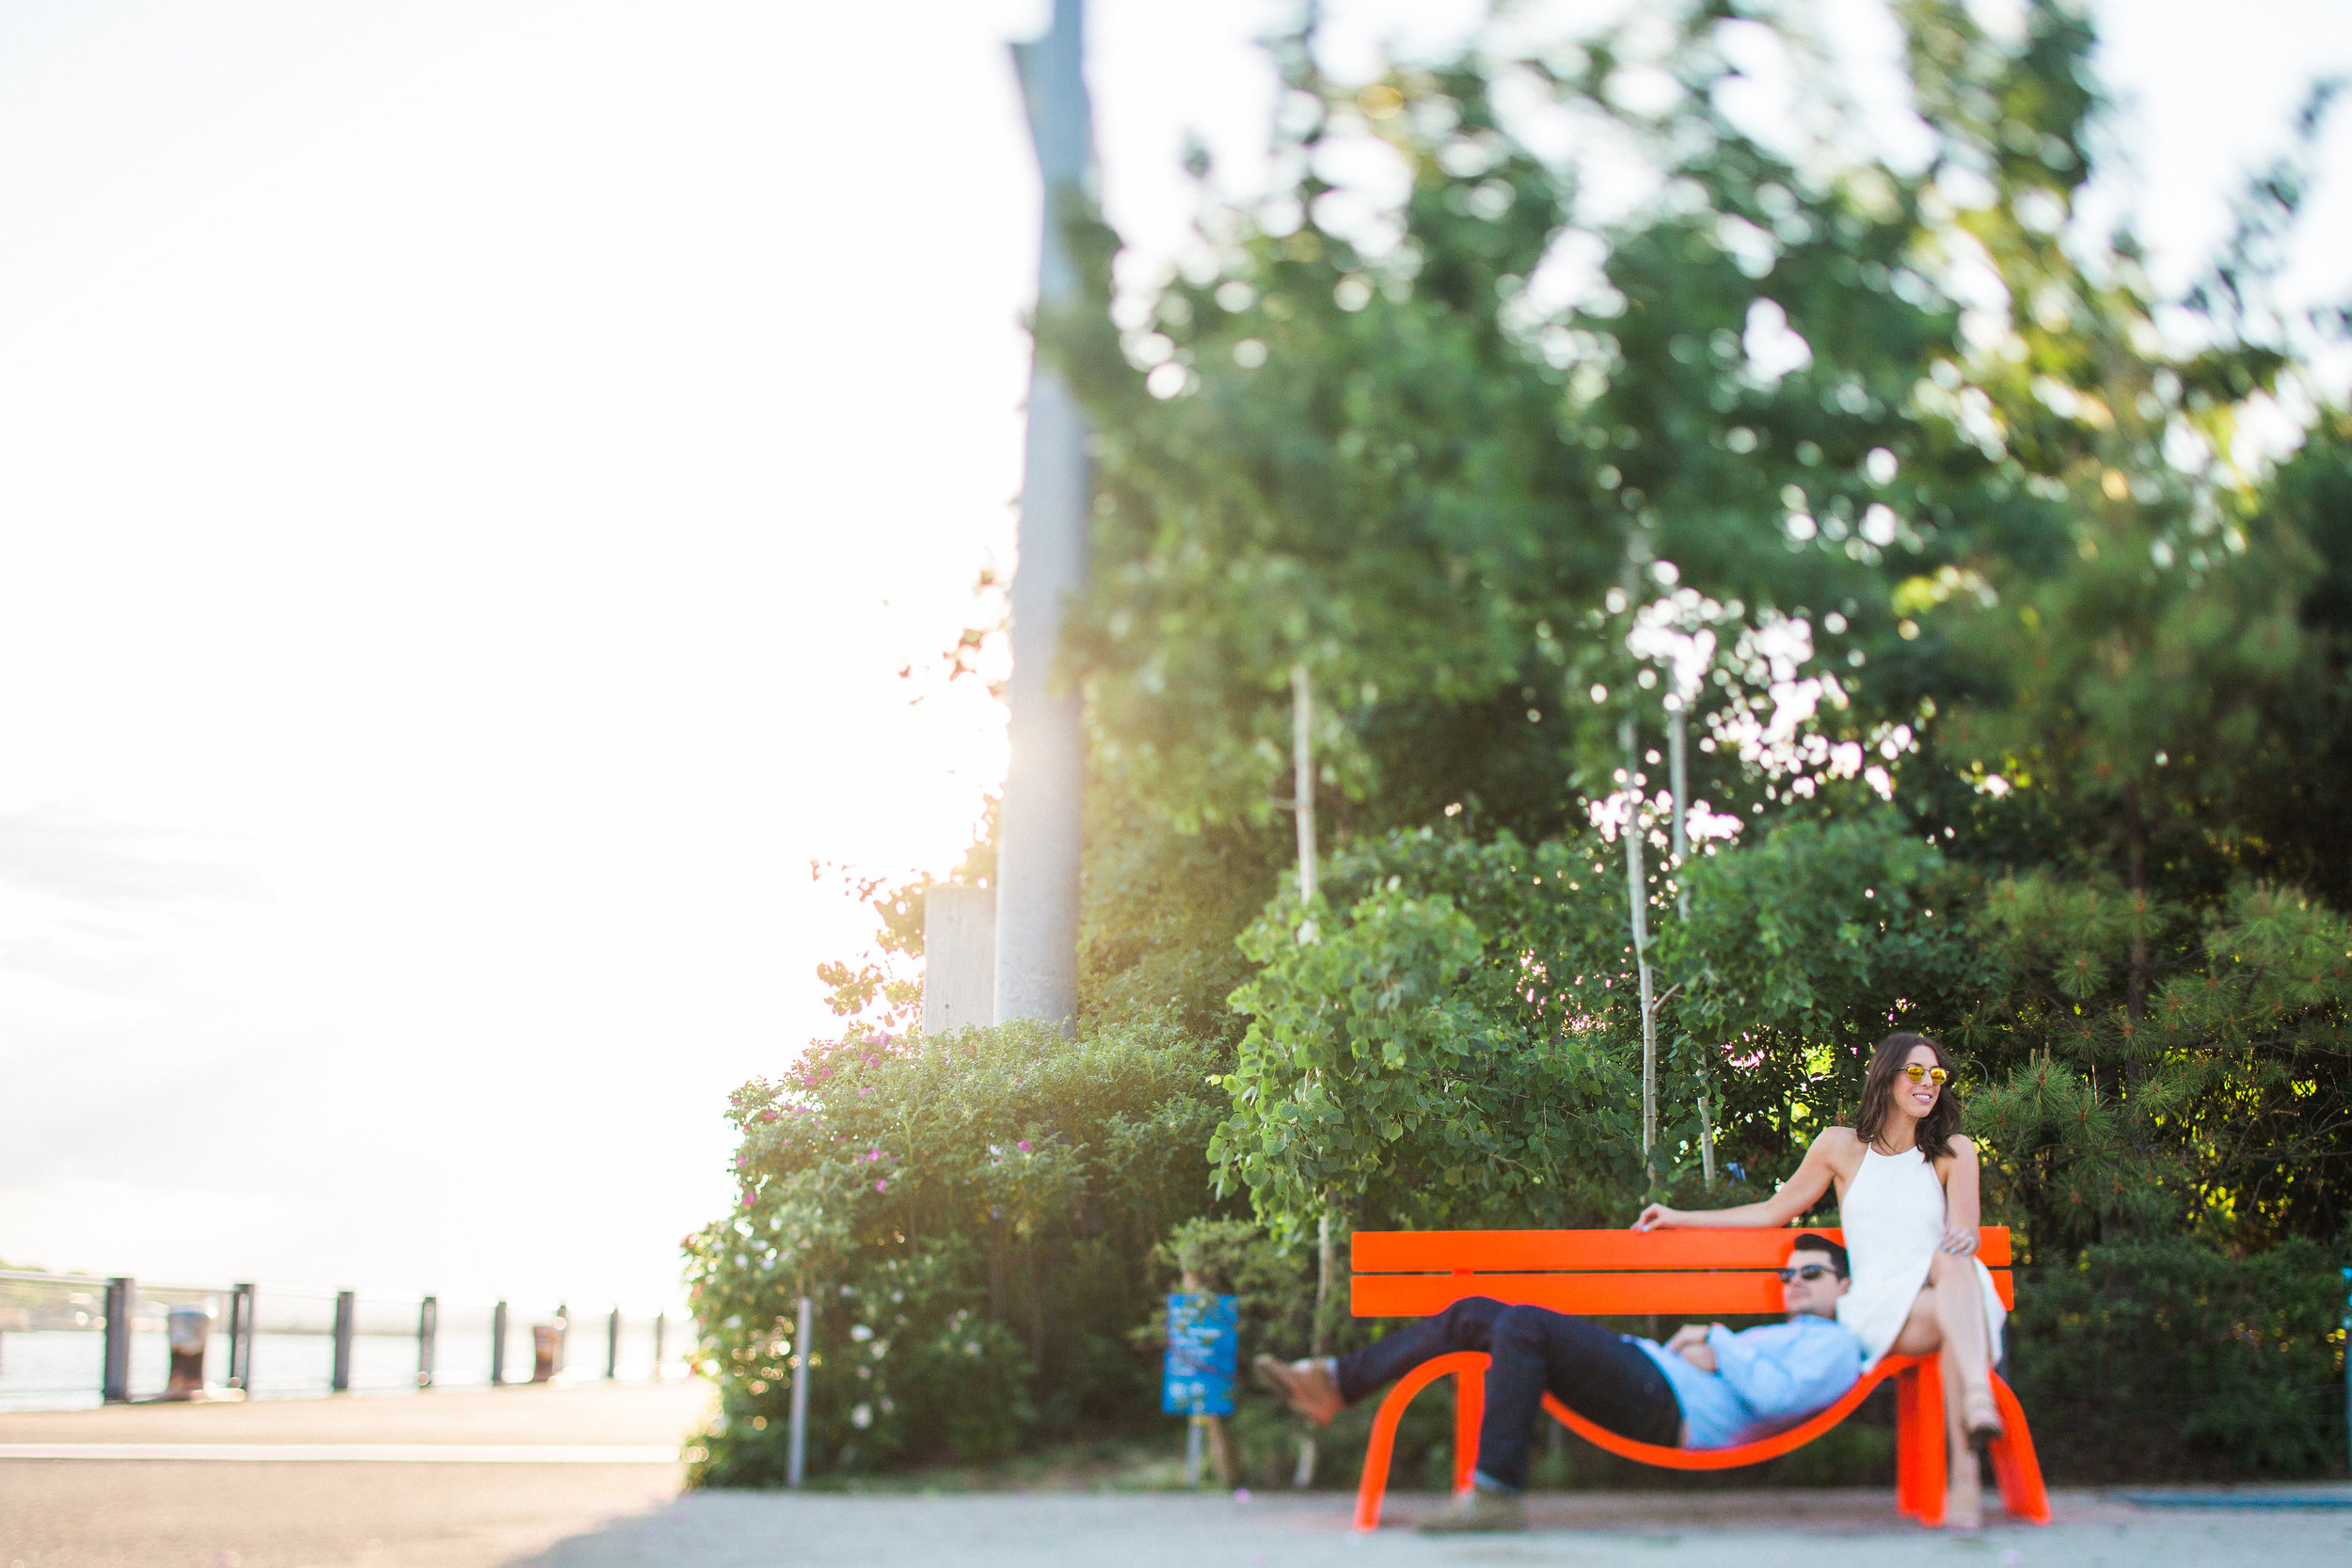 nicki-sebastian-photography_nyc_brooklyn_engagement_photography-1-4.jpg